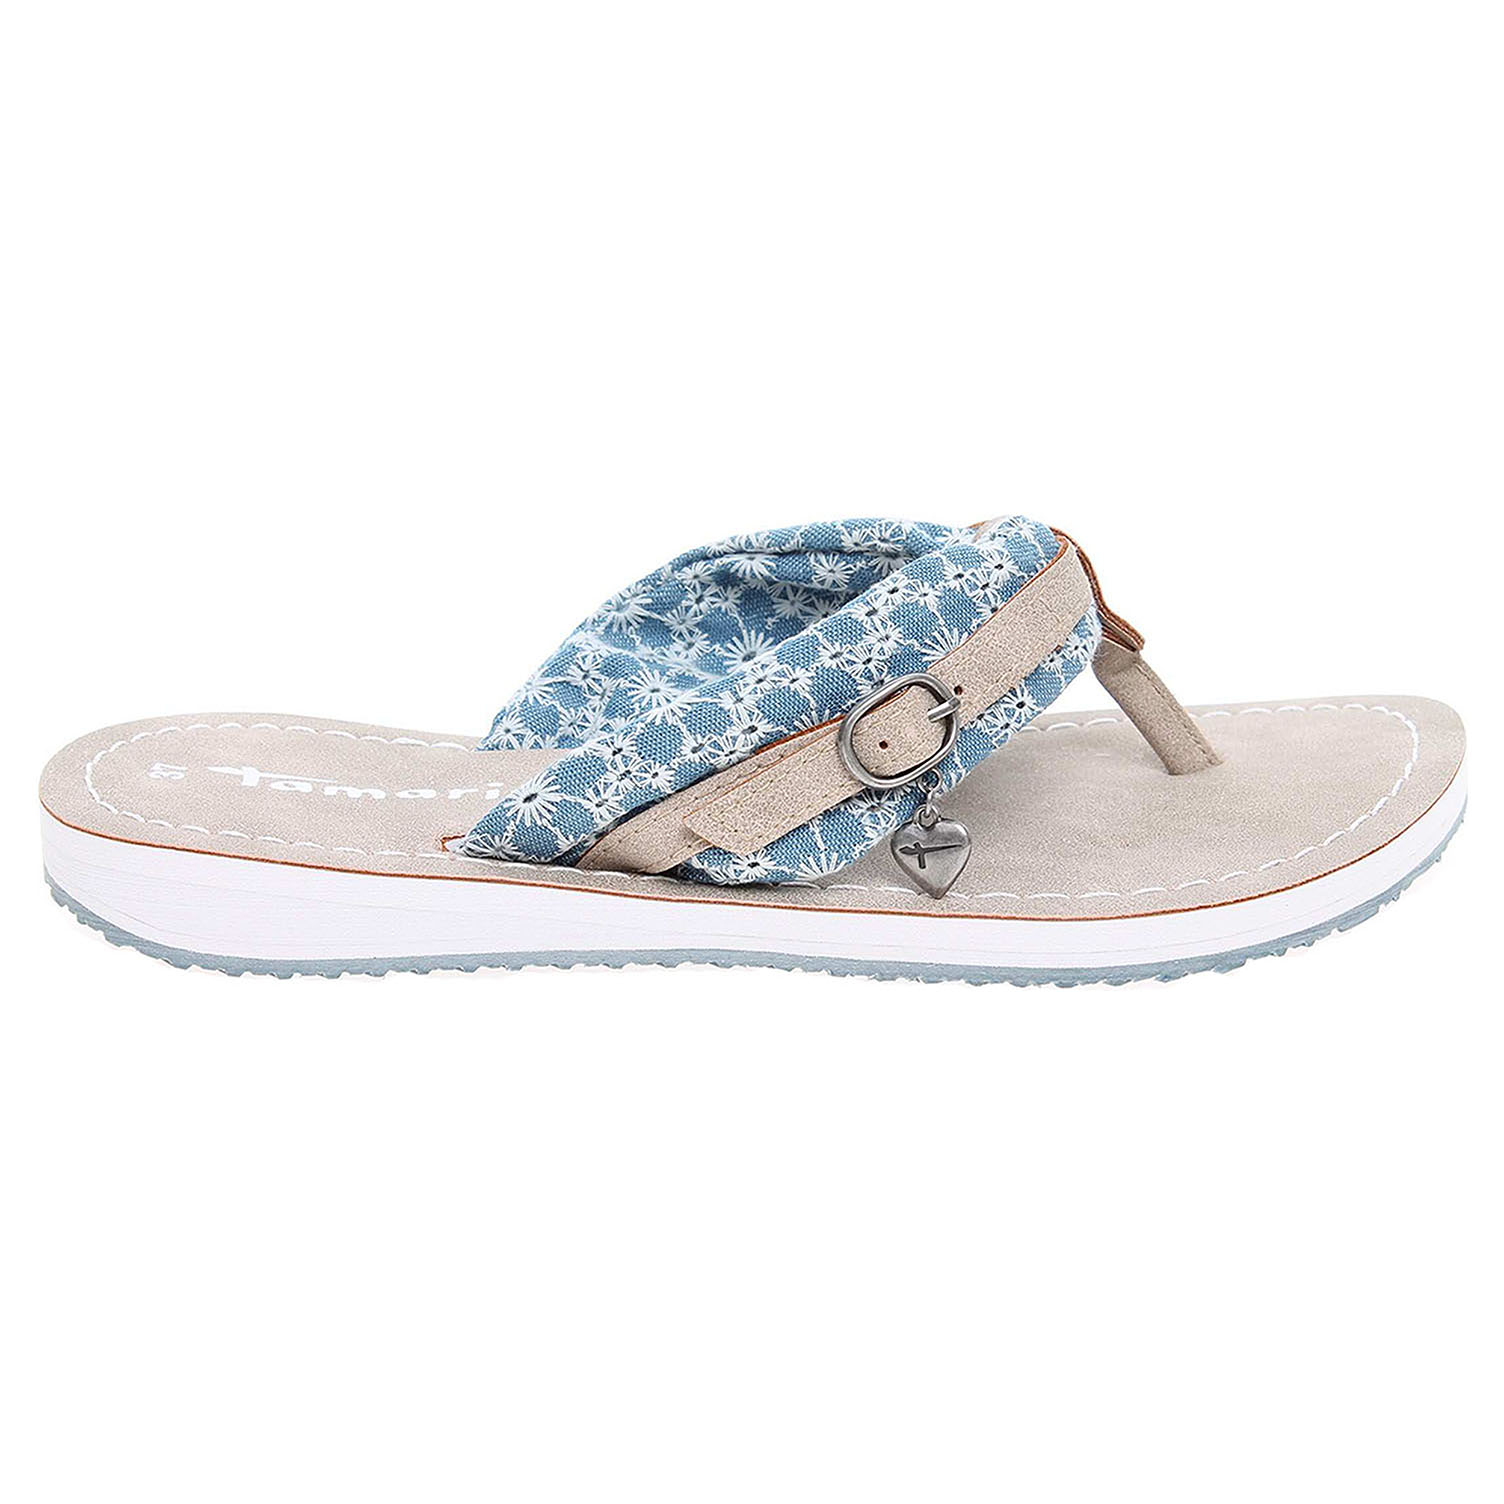 Ecco Tamaris dámské plážové pantofle 1-27109-28 modré 23700319